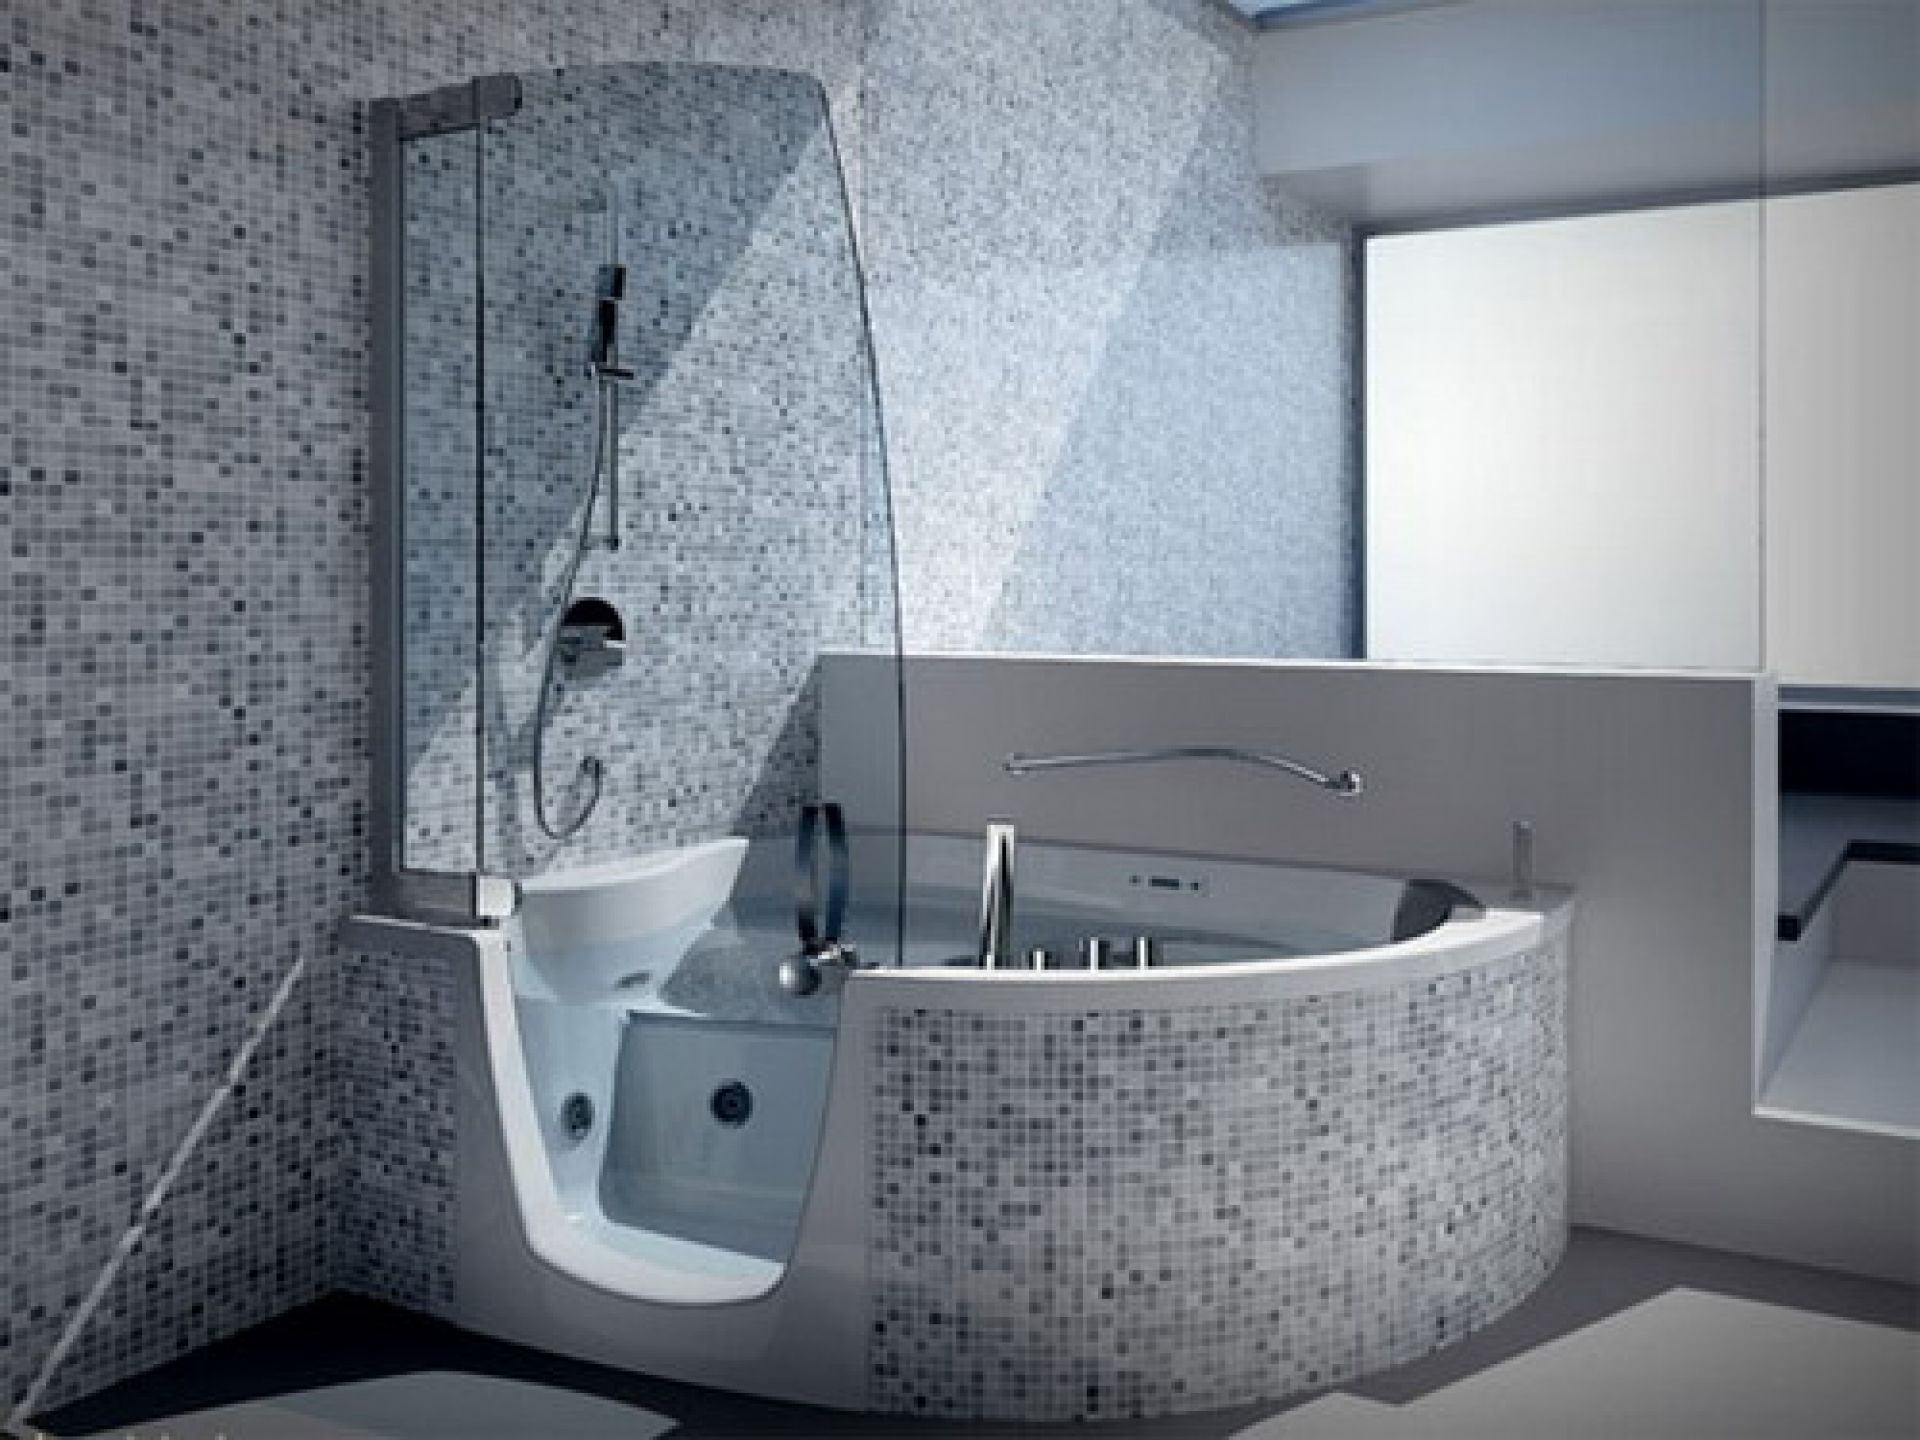 A Glass Walk In Tub Shower Lovely Shower Tub Bathtub Shower